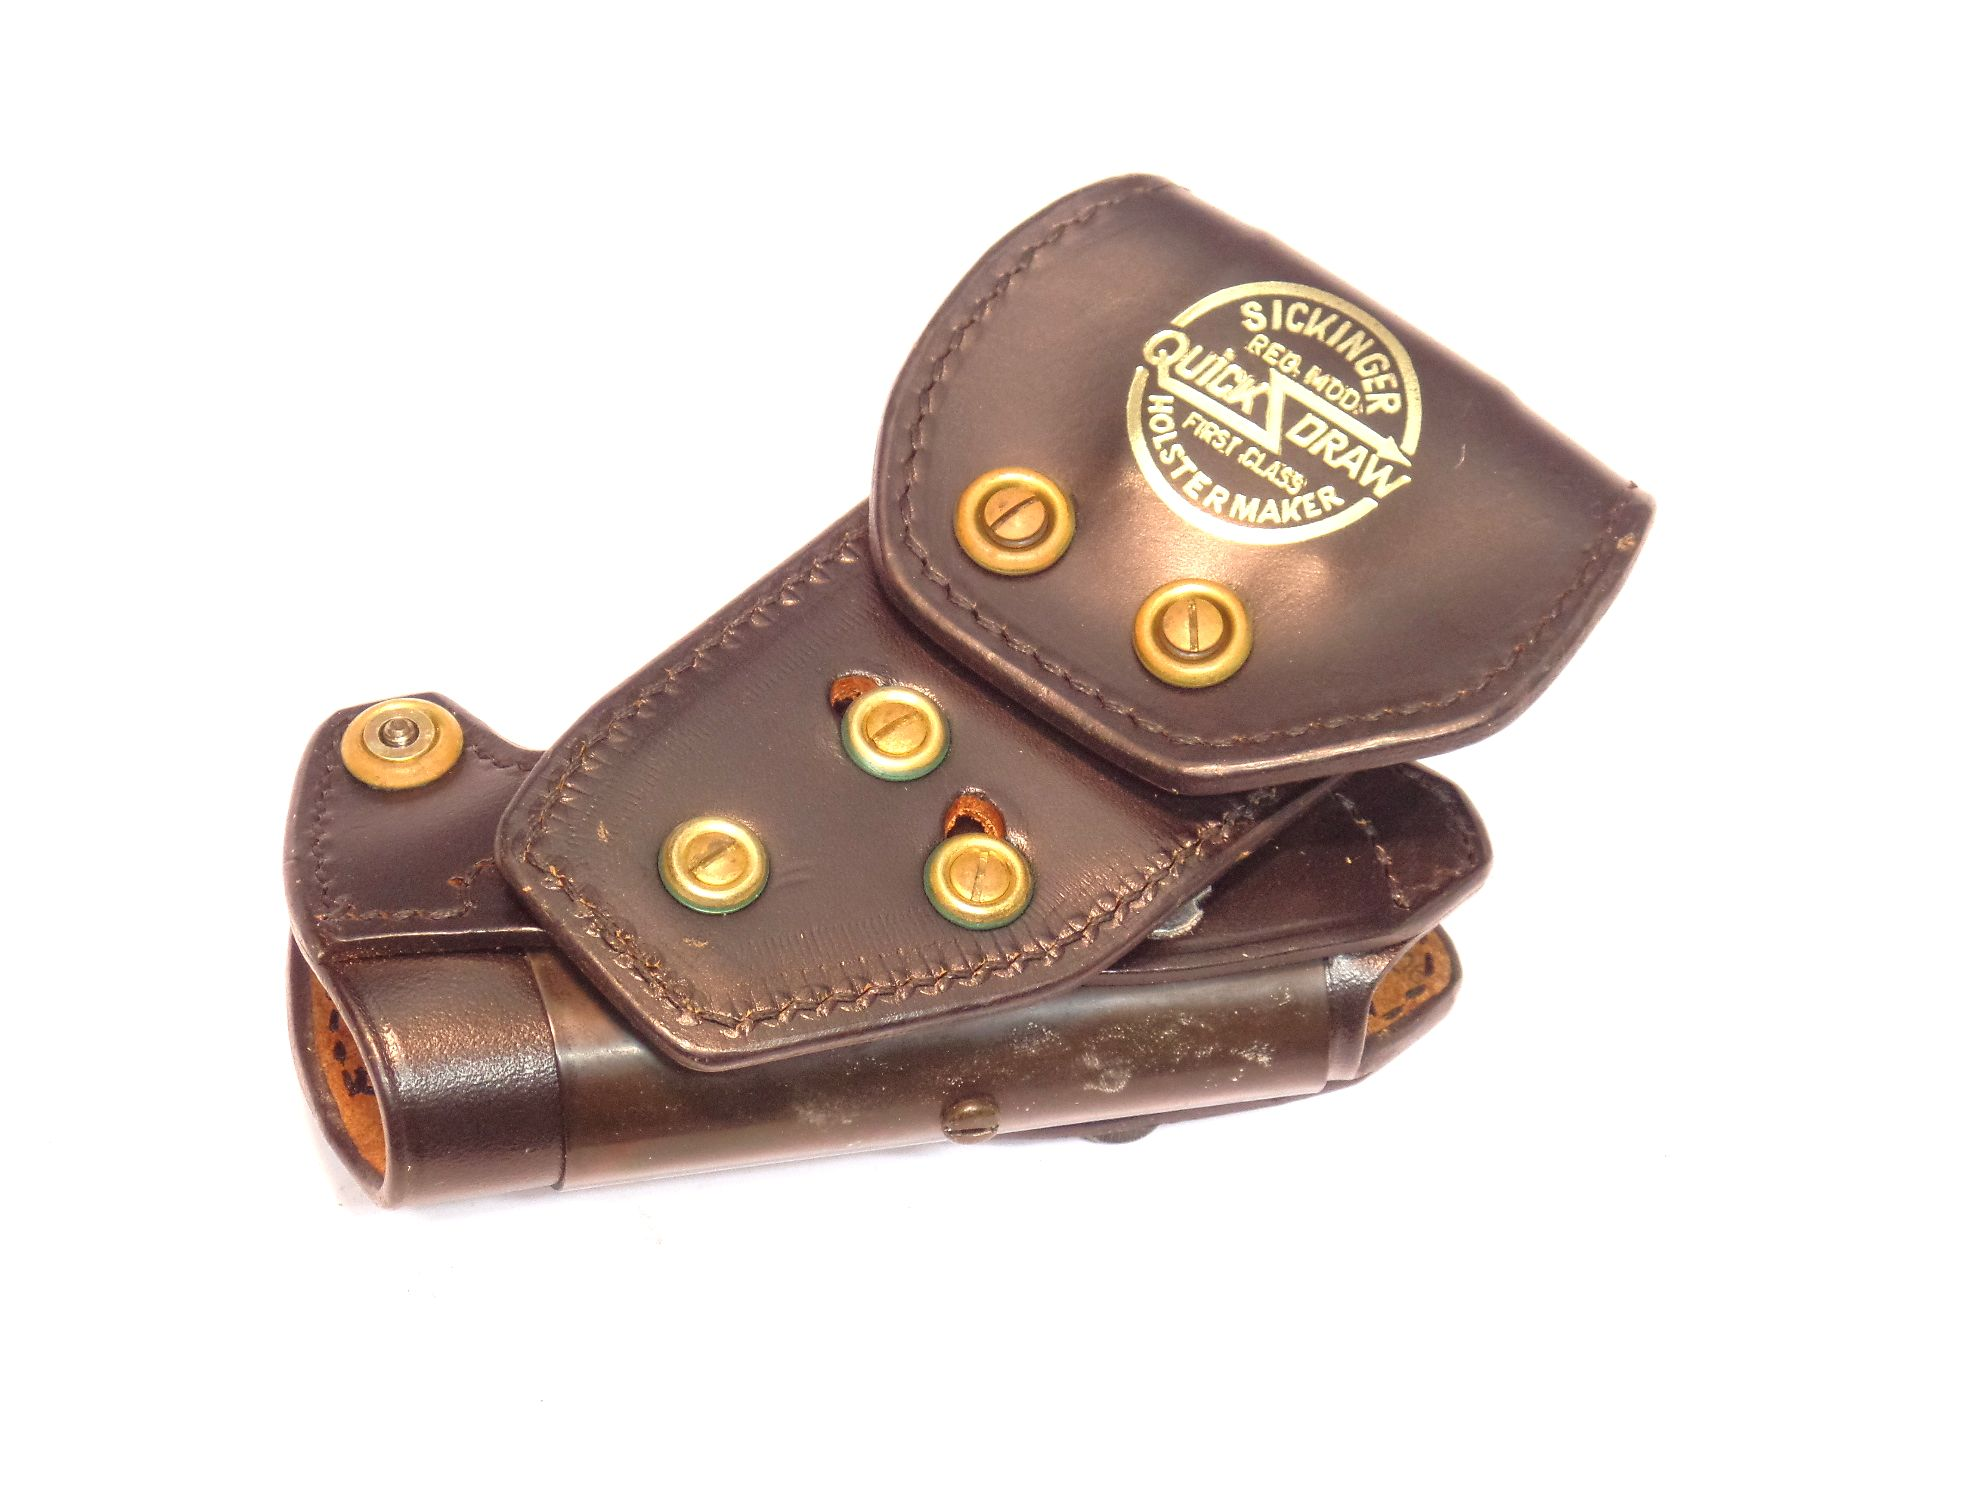 "Holster Sickinger QuickDraw CZ BERETTA SIG Revolver 4"""